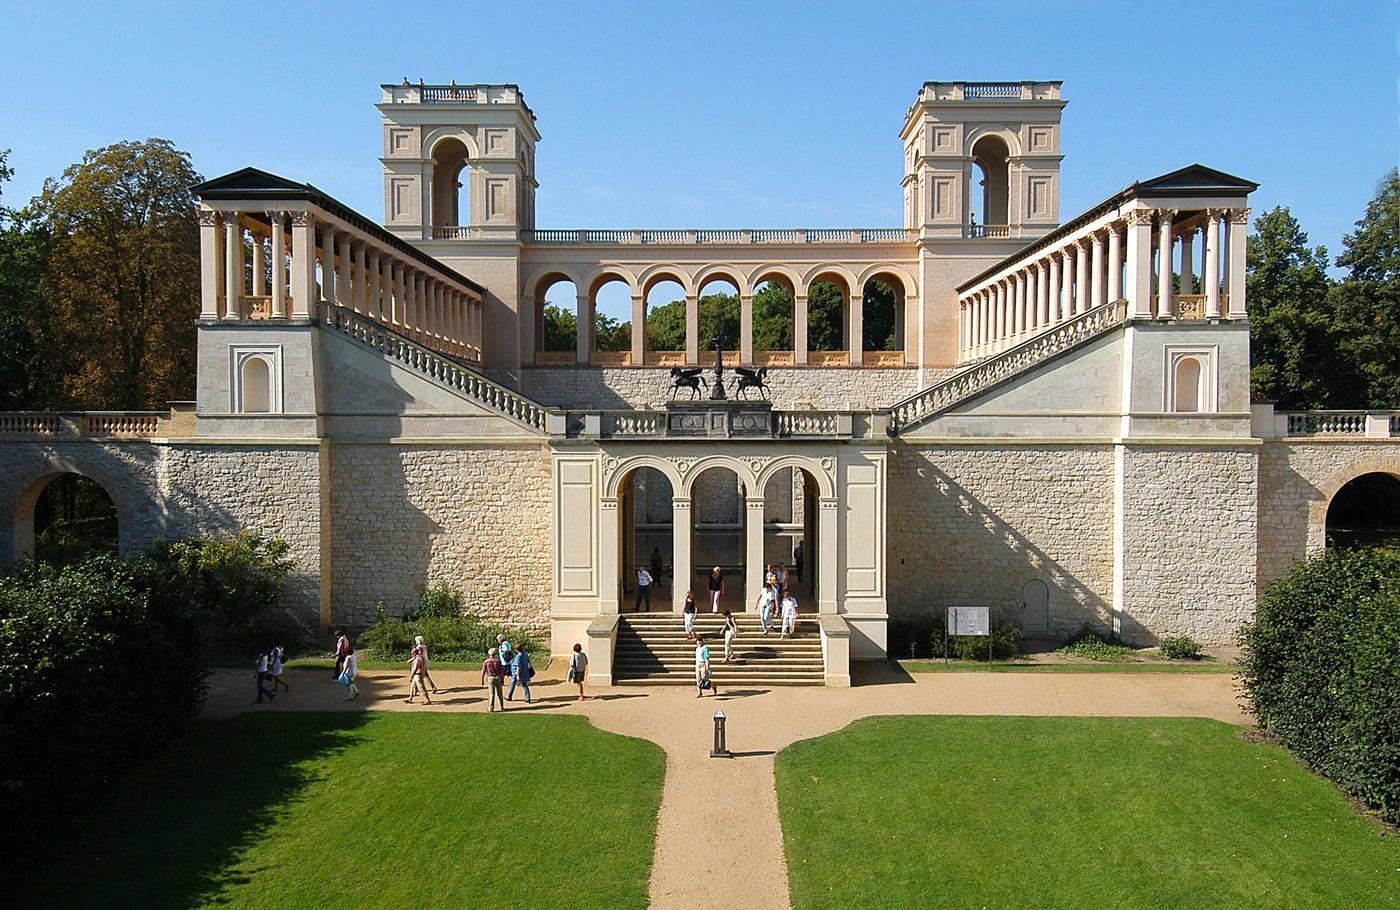 Ausflug mit Kindern nach Potsdam: Belvedere Pfingstberg // HIMBEER